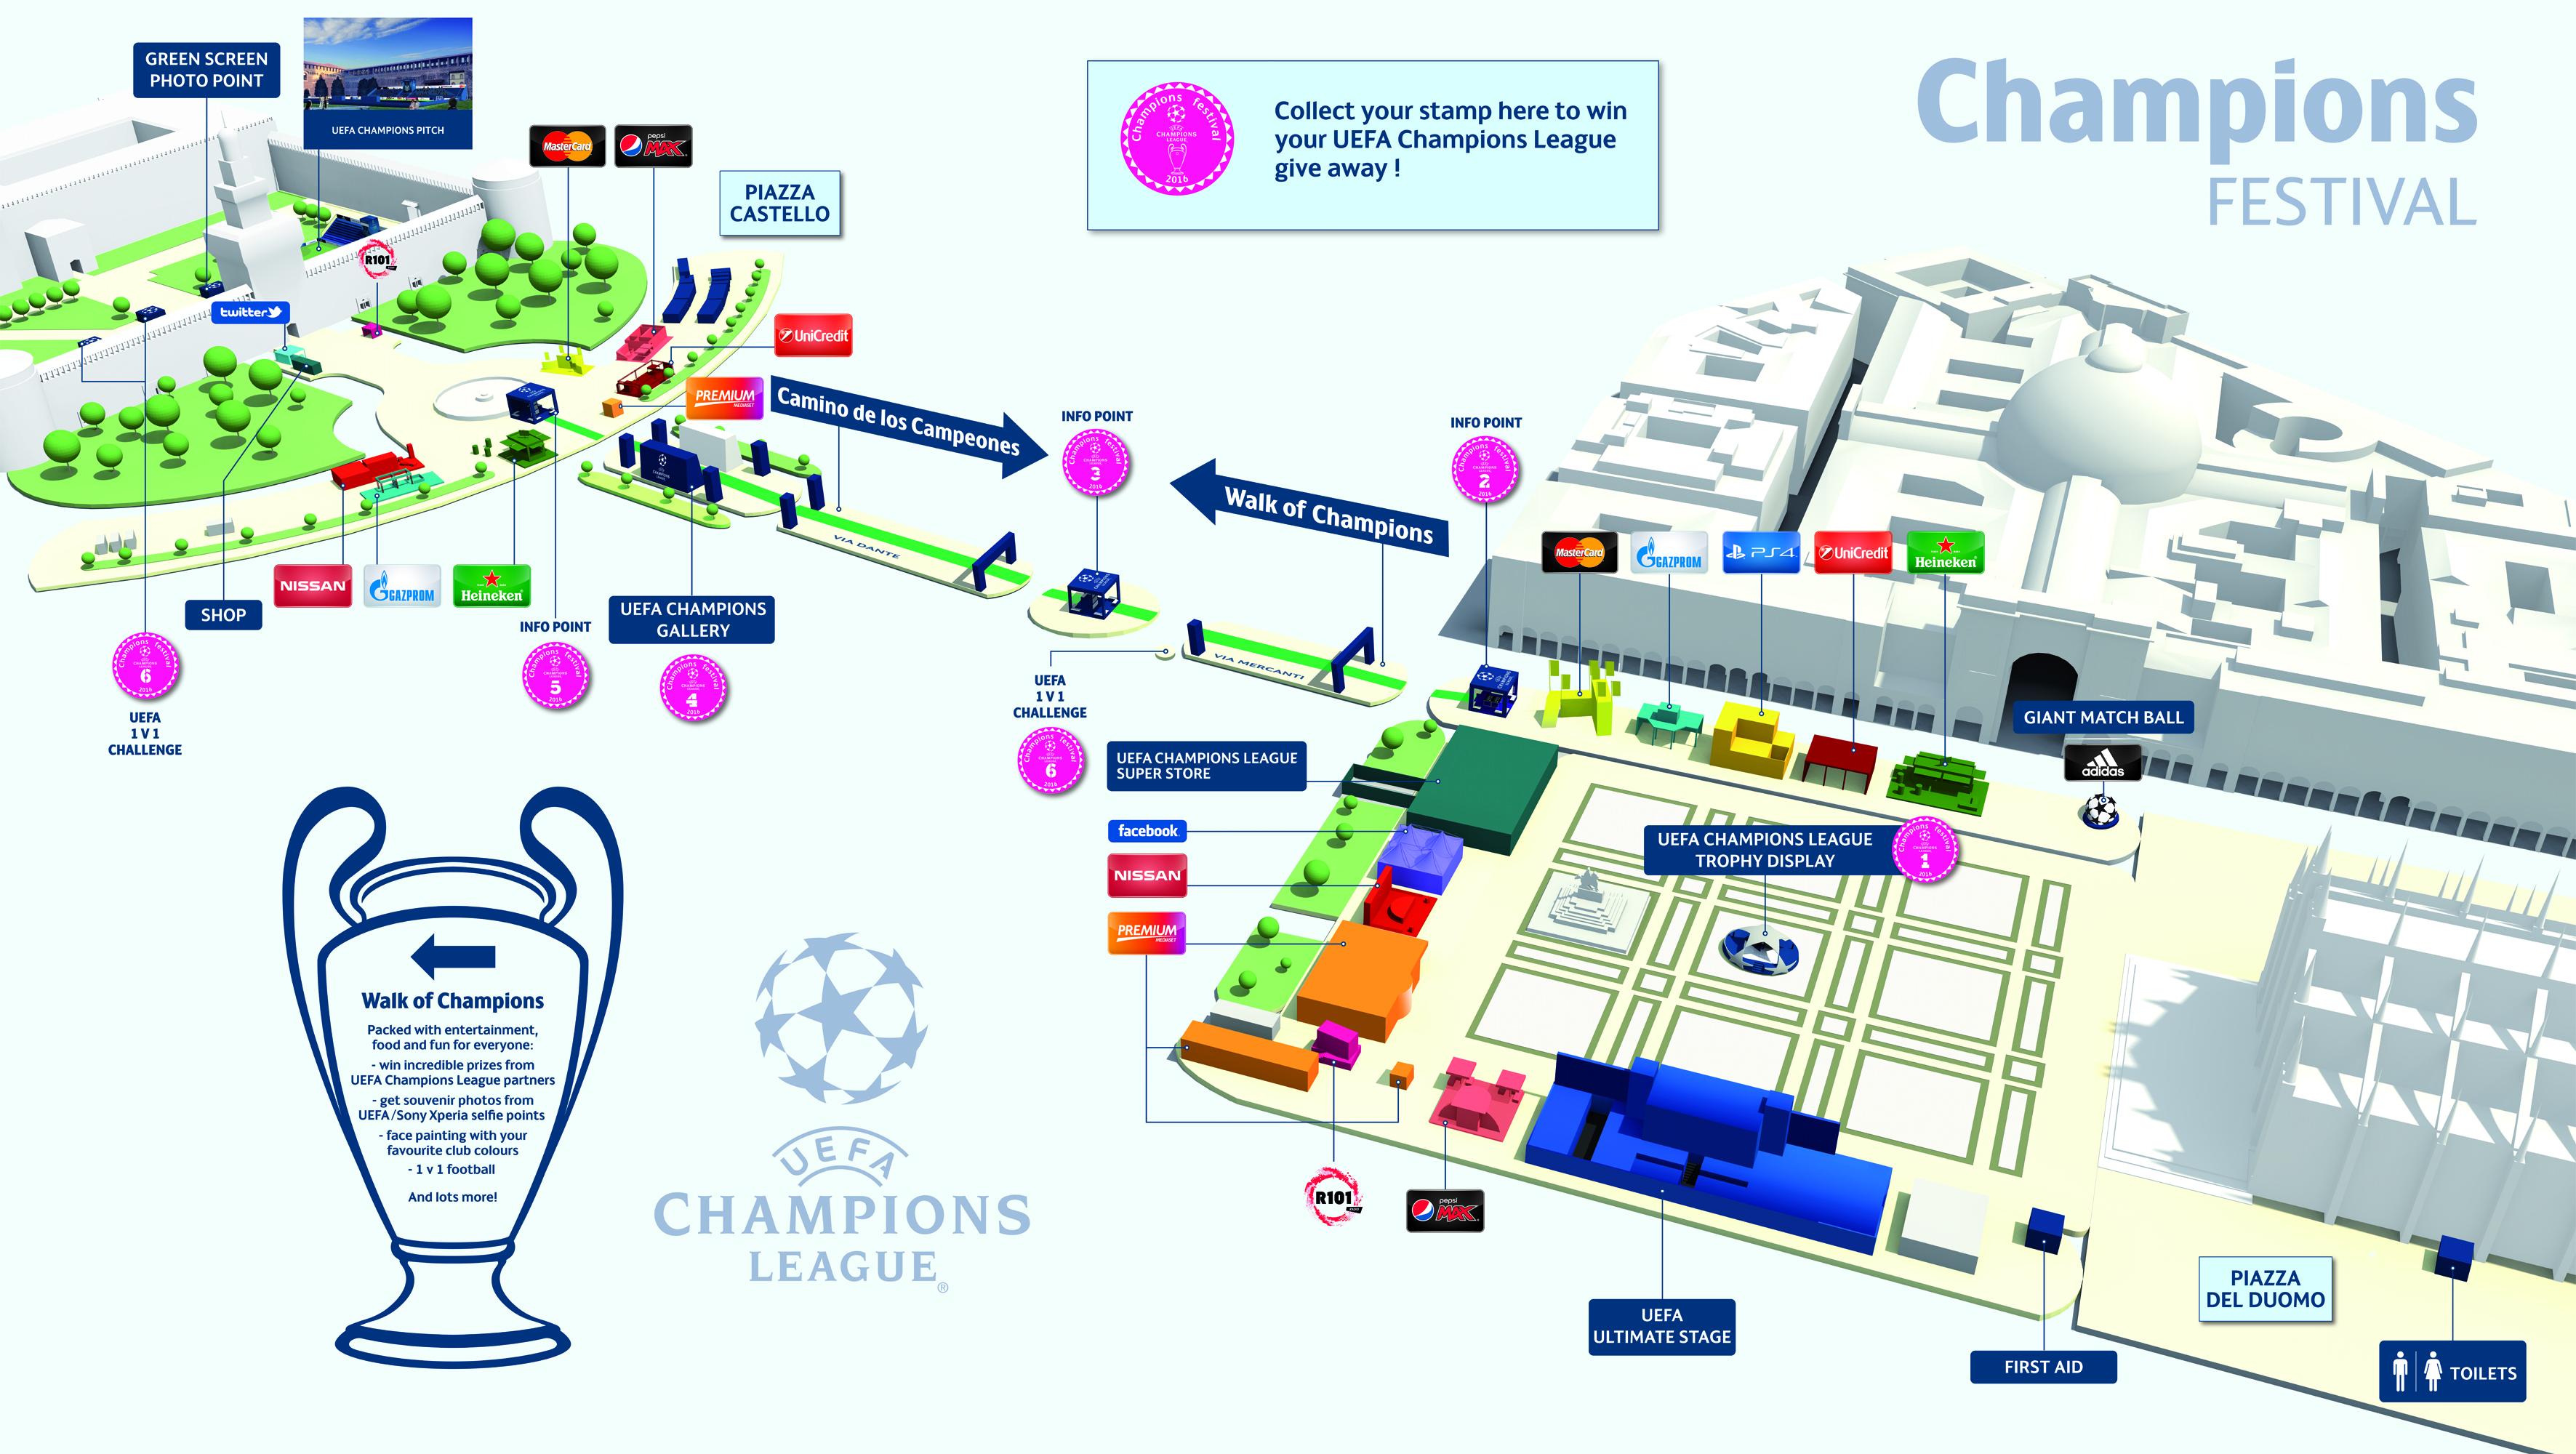 UEFA Champions Festival 2016 In Milan